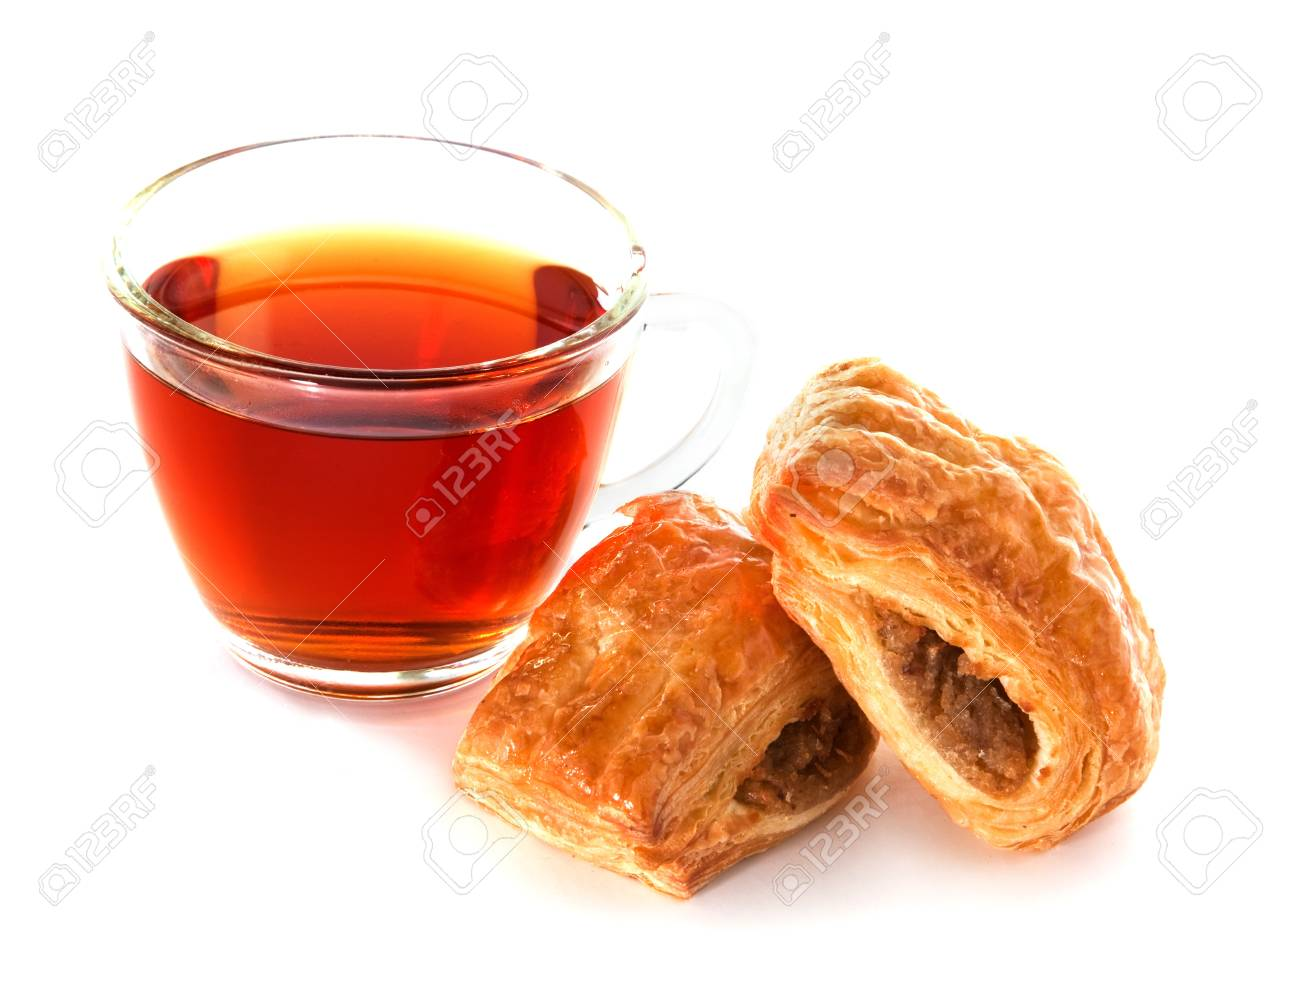 Cup of tea with cinnamon Danish bun  on white background Stock Photo - 13510943